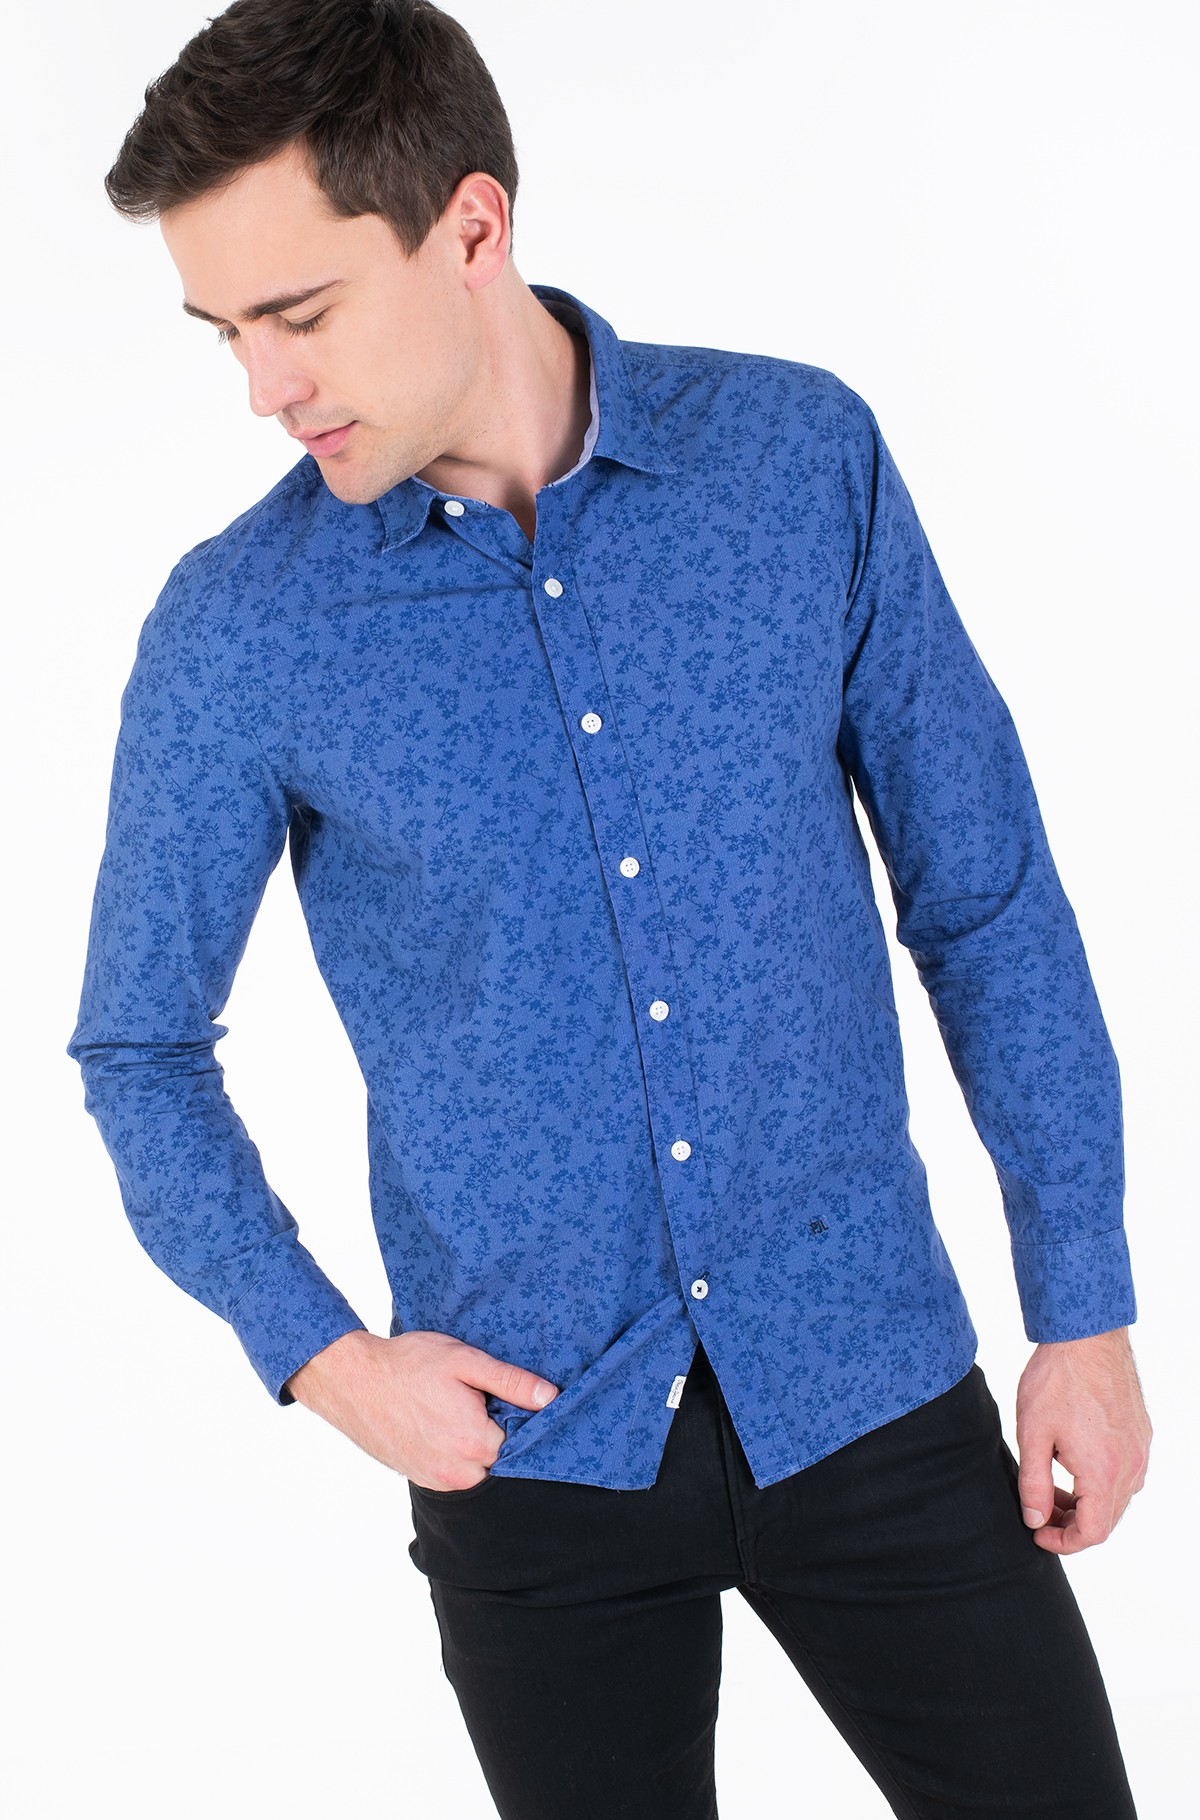 Marškiniai LIAM/PM306108-full-1